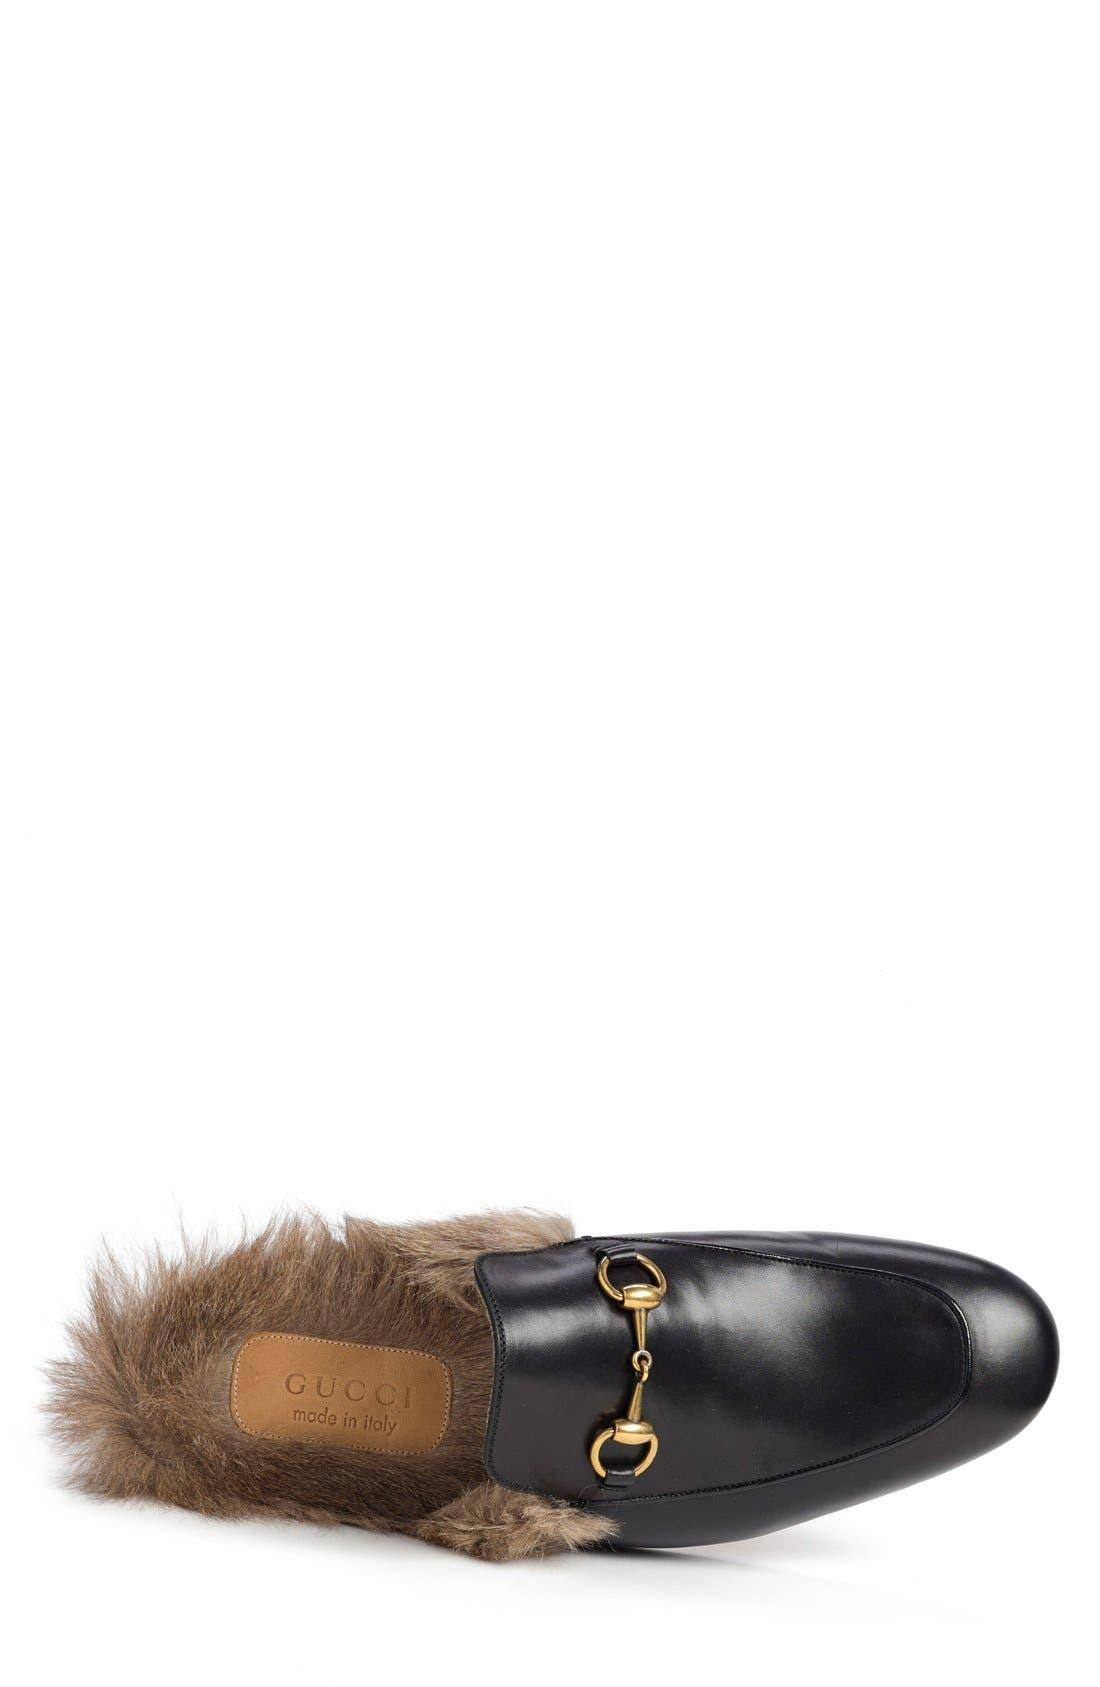 Princetown Genuine Shearling Slipper,                             Alternate thumbnail 3, color,                             Blk-Tan